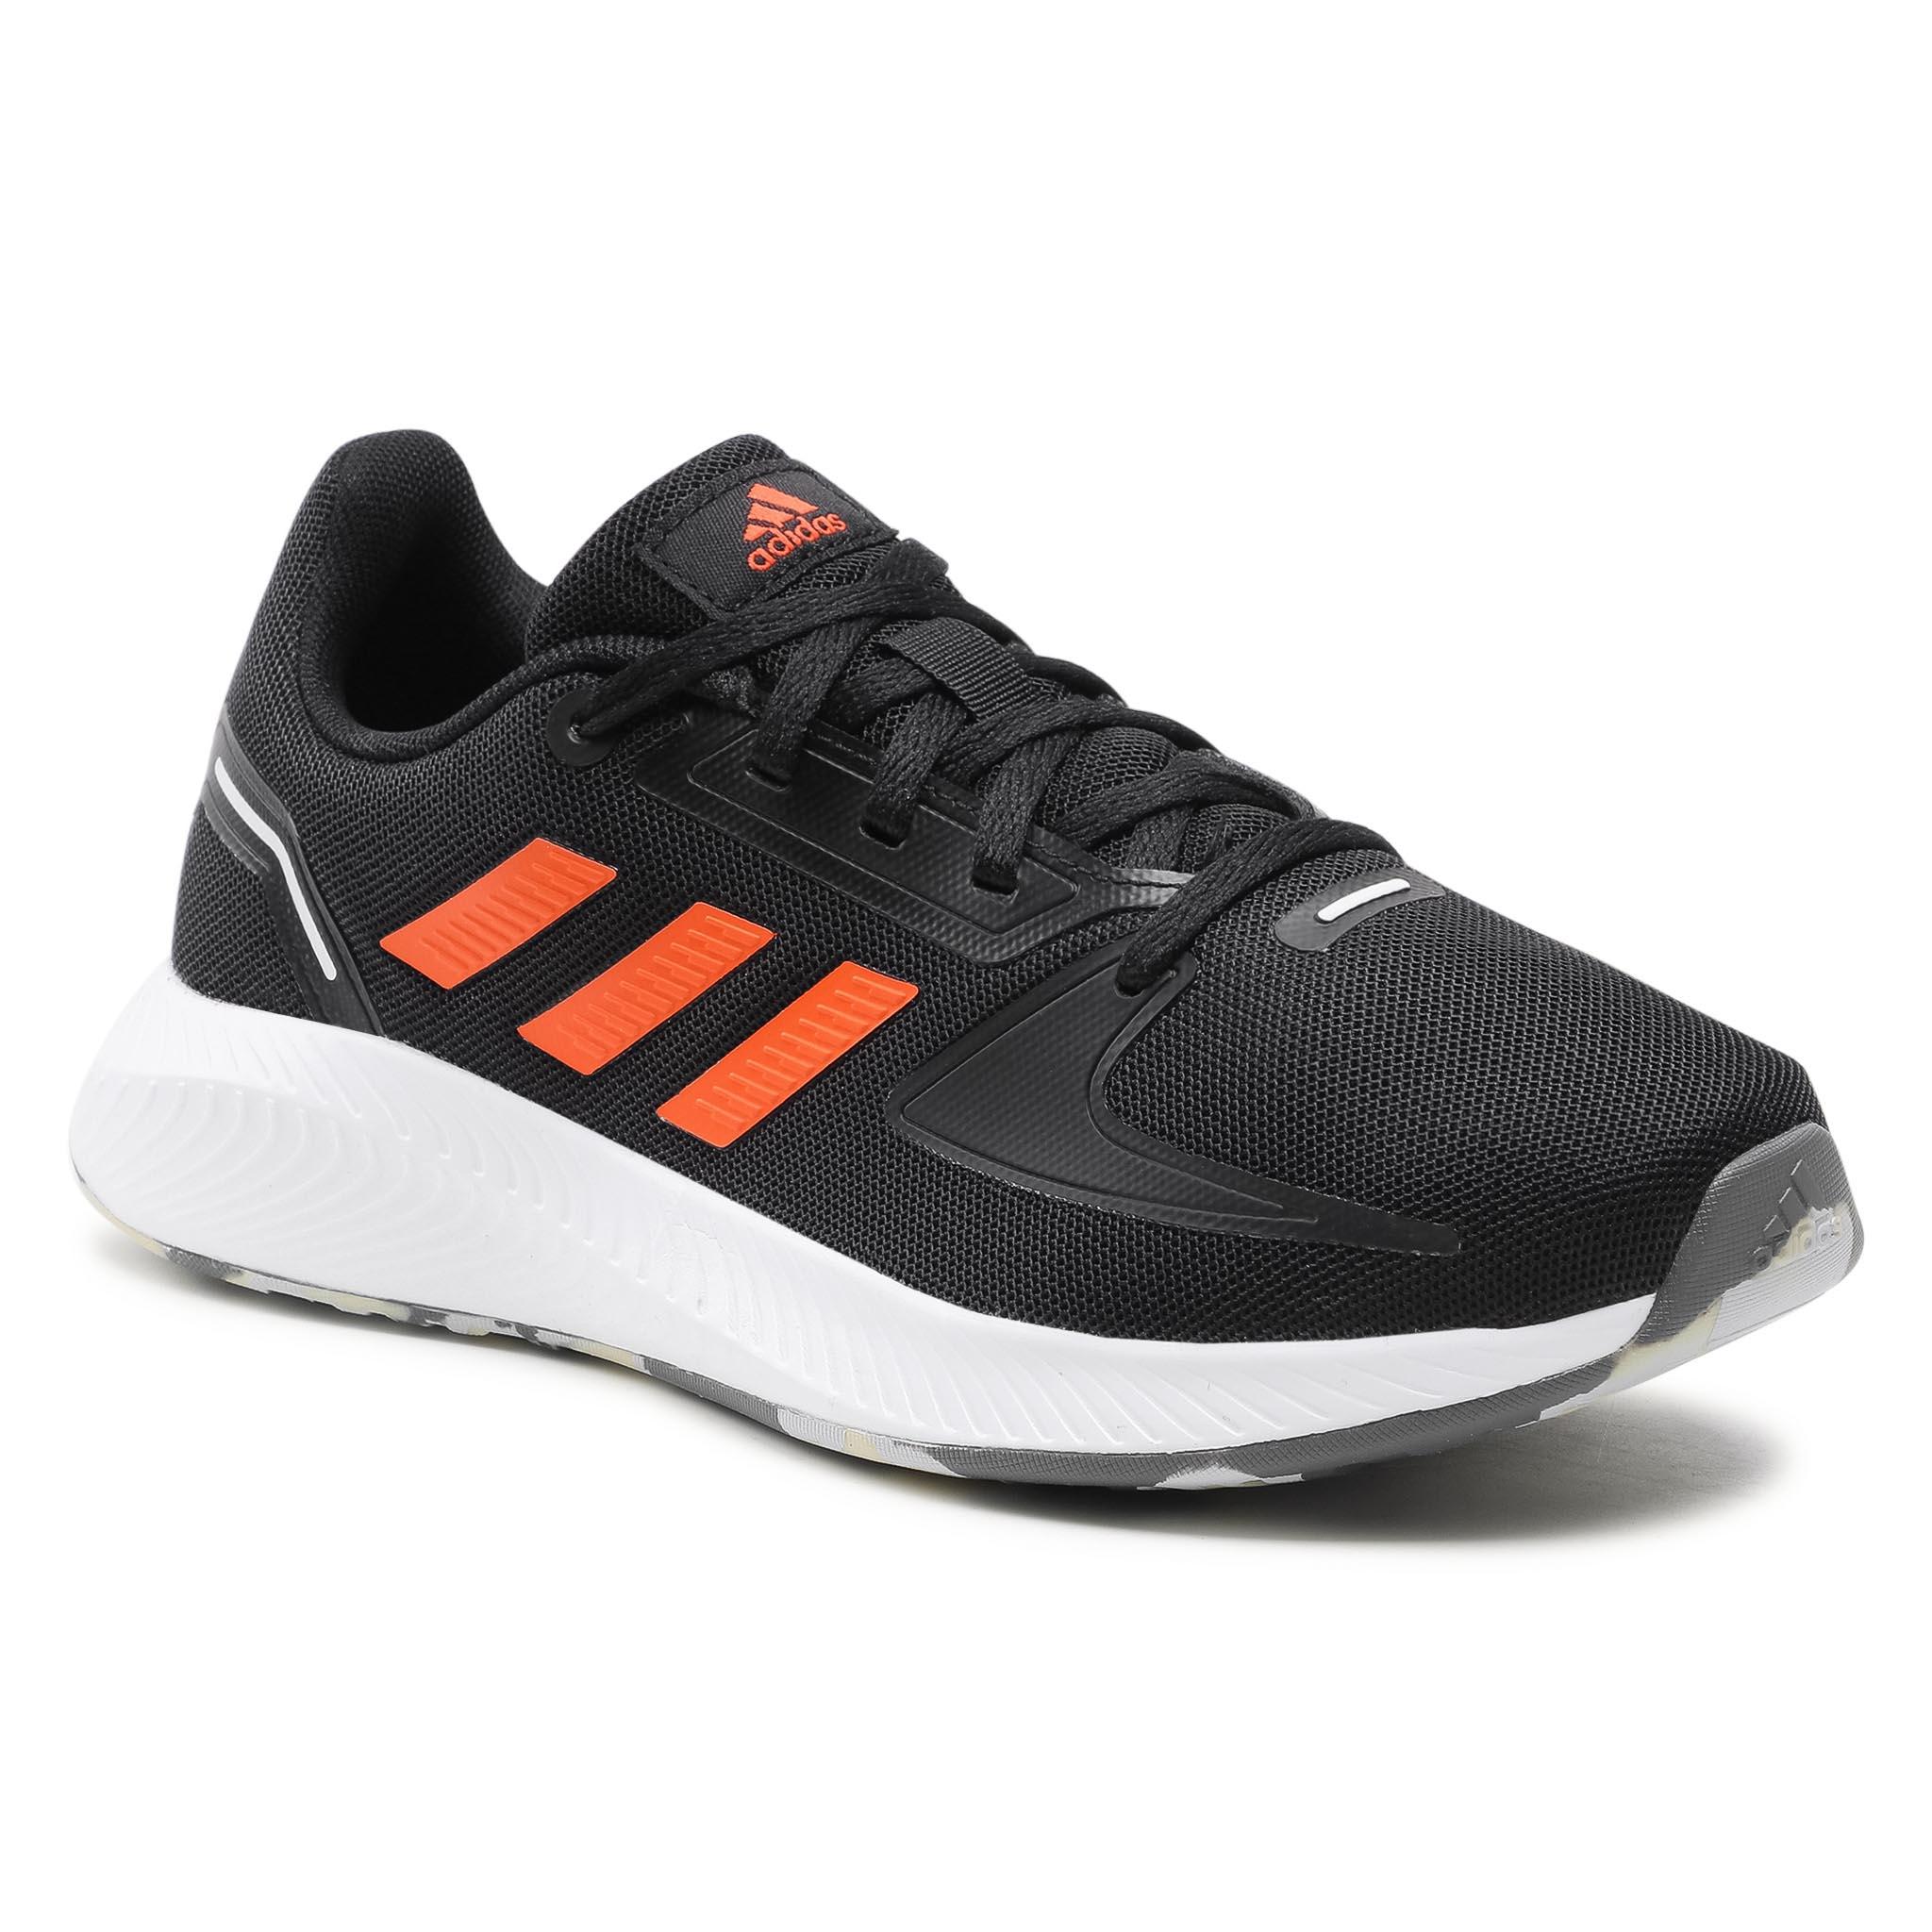 Scarpe adidas - Runfalcon 2.0 K FY9500 Cblack/Truora/Ftwwht